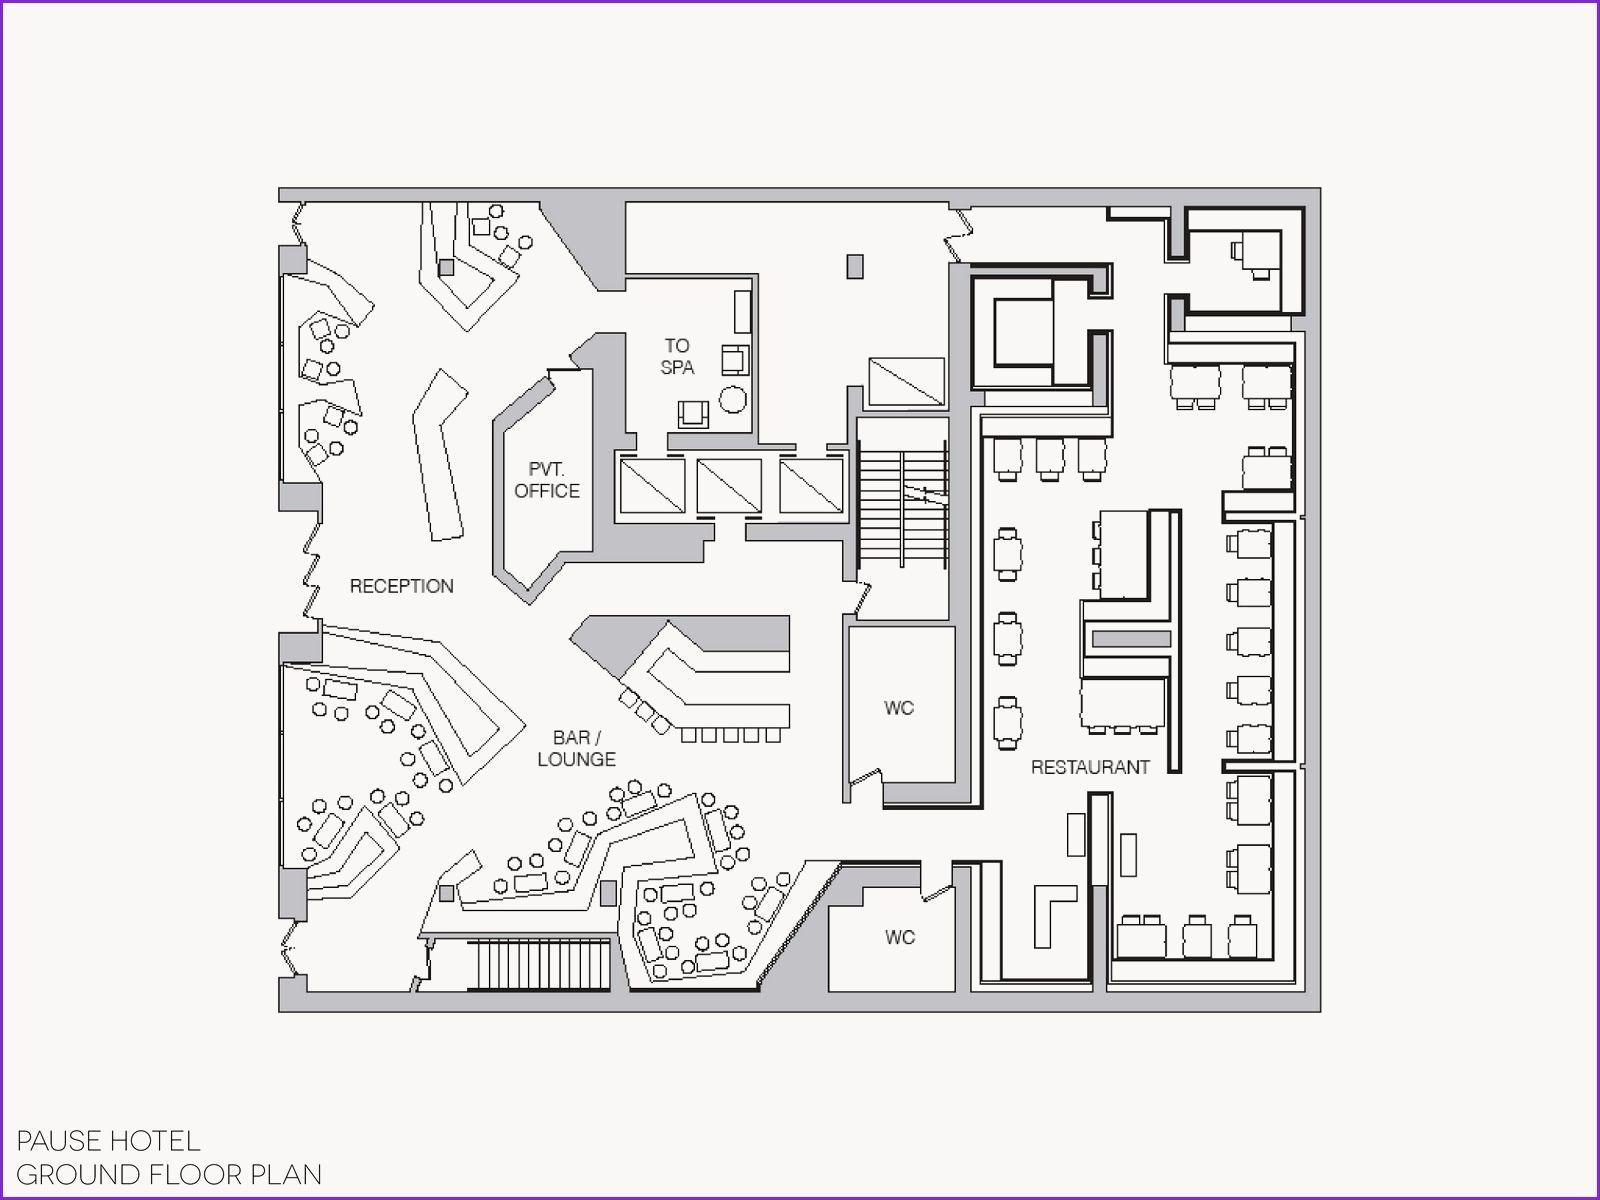 Hotel Floor Plan Awesome Create Your Own Floor Plan Create Your Own Floor Plan Awesome Create Your Own Flo Hotel Floor Plan Restaurant Floor Plan Floor Plans